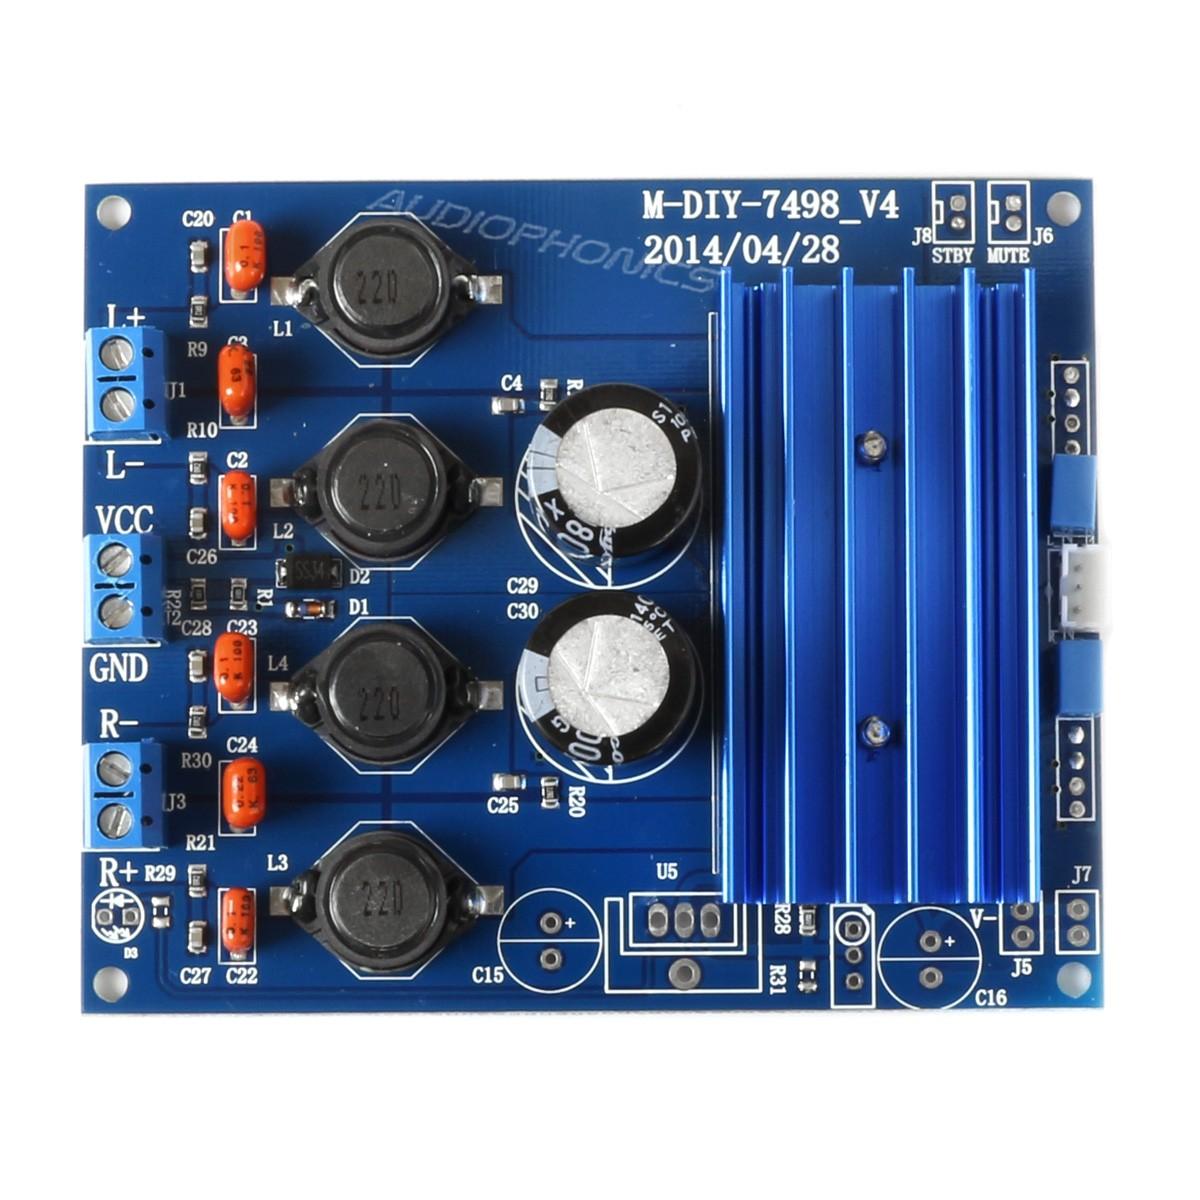 FX AUDIO M-DIY V4 TDA7498 Class D Amplifier Module 2x50W 8 Ohm